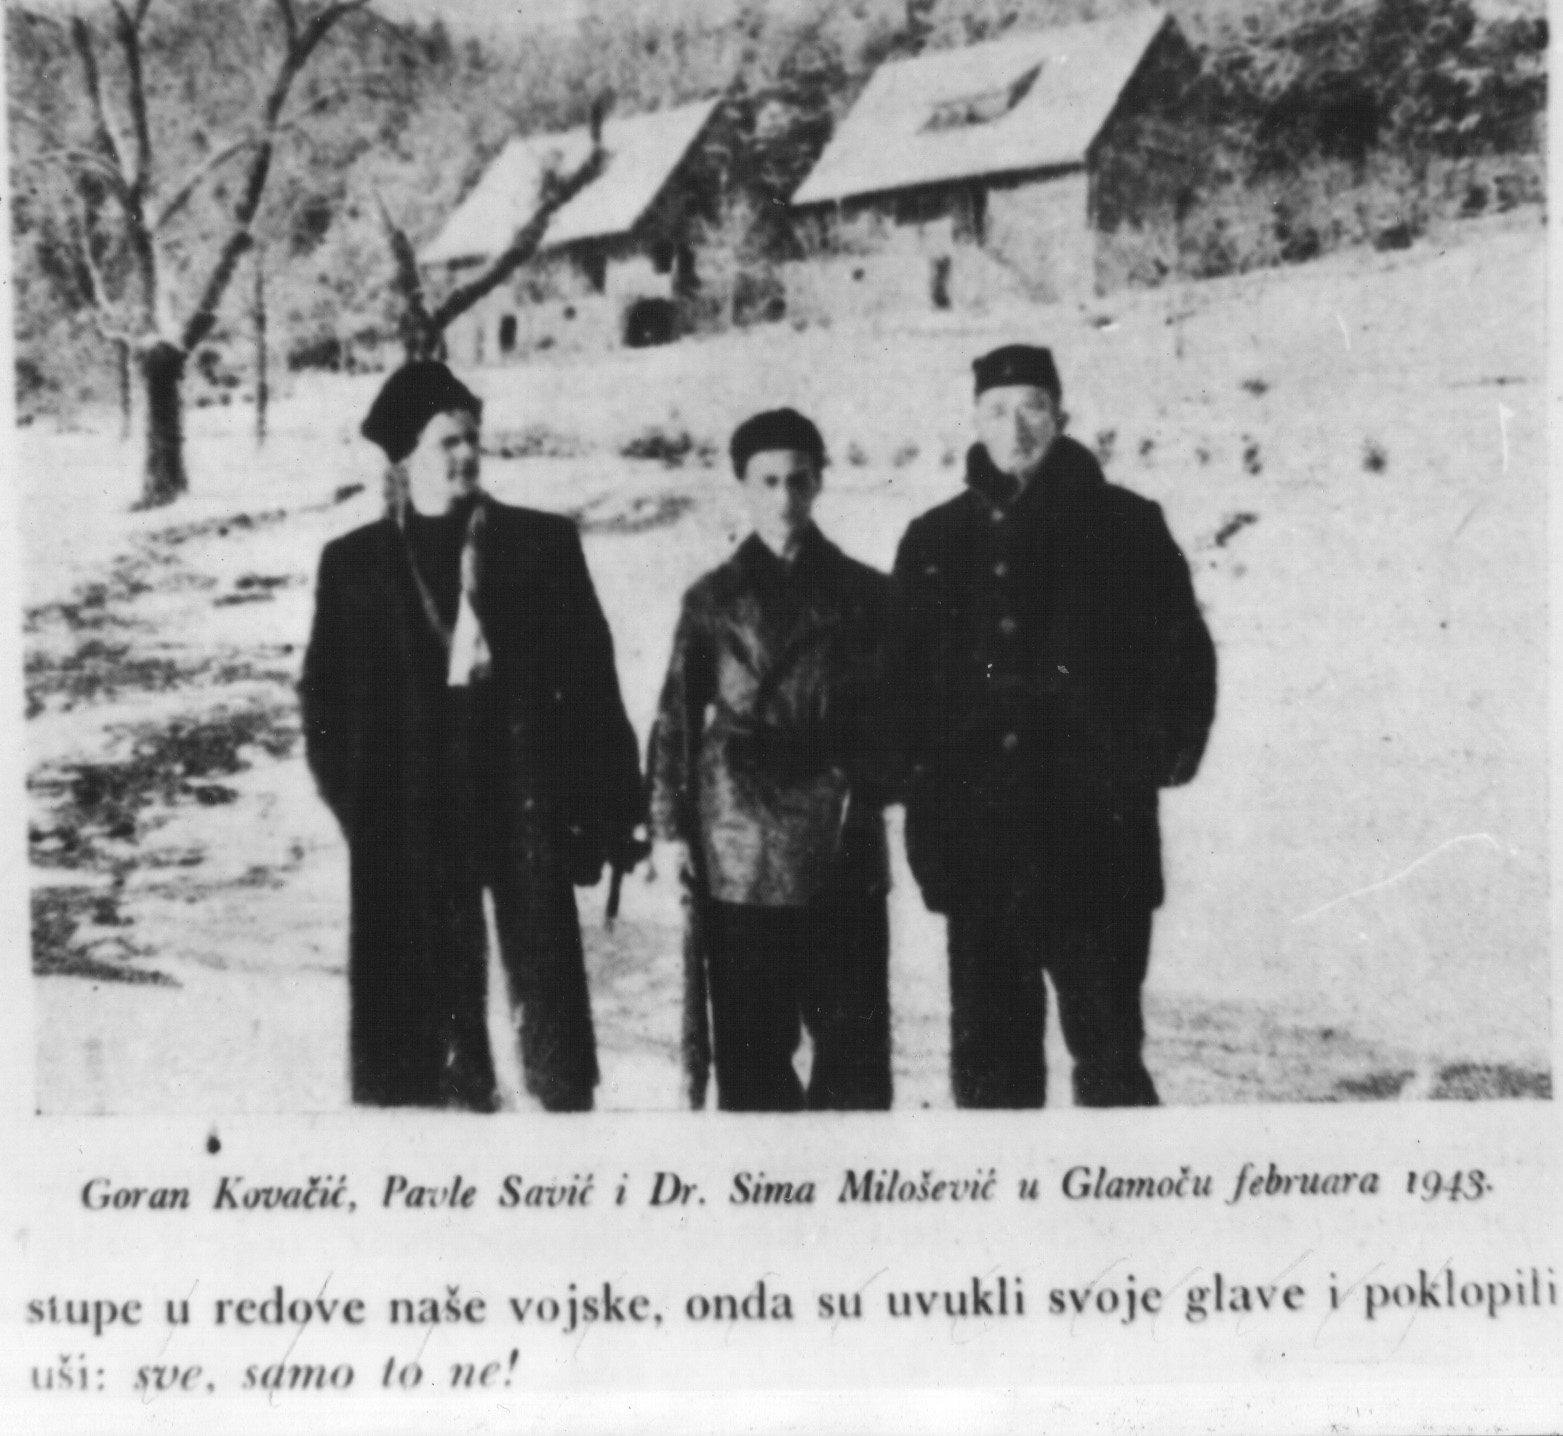 File Ivan Goran Kovacic Pavle Savic I Dr Sima Milosevic Jpg